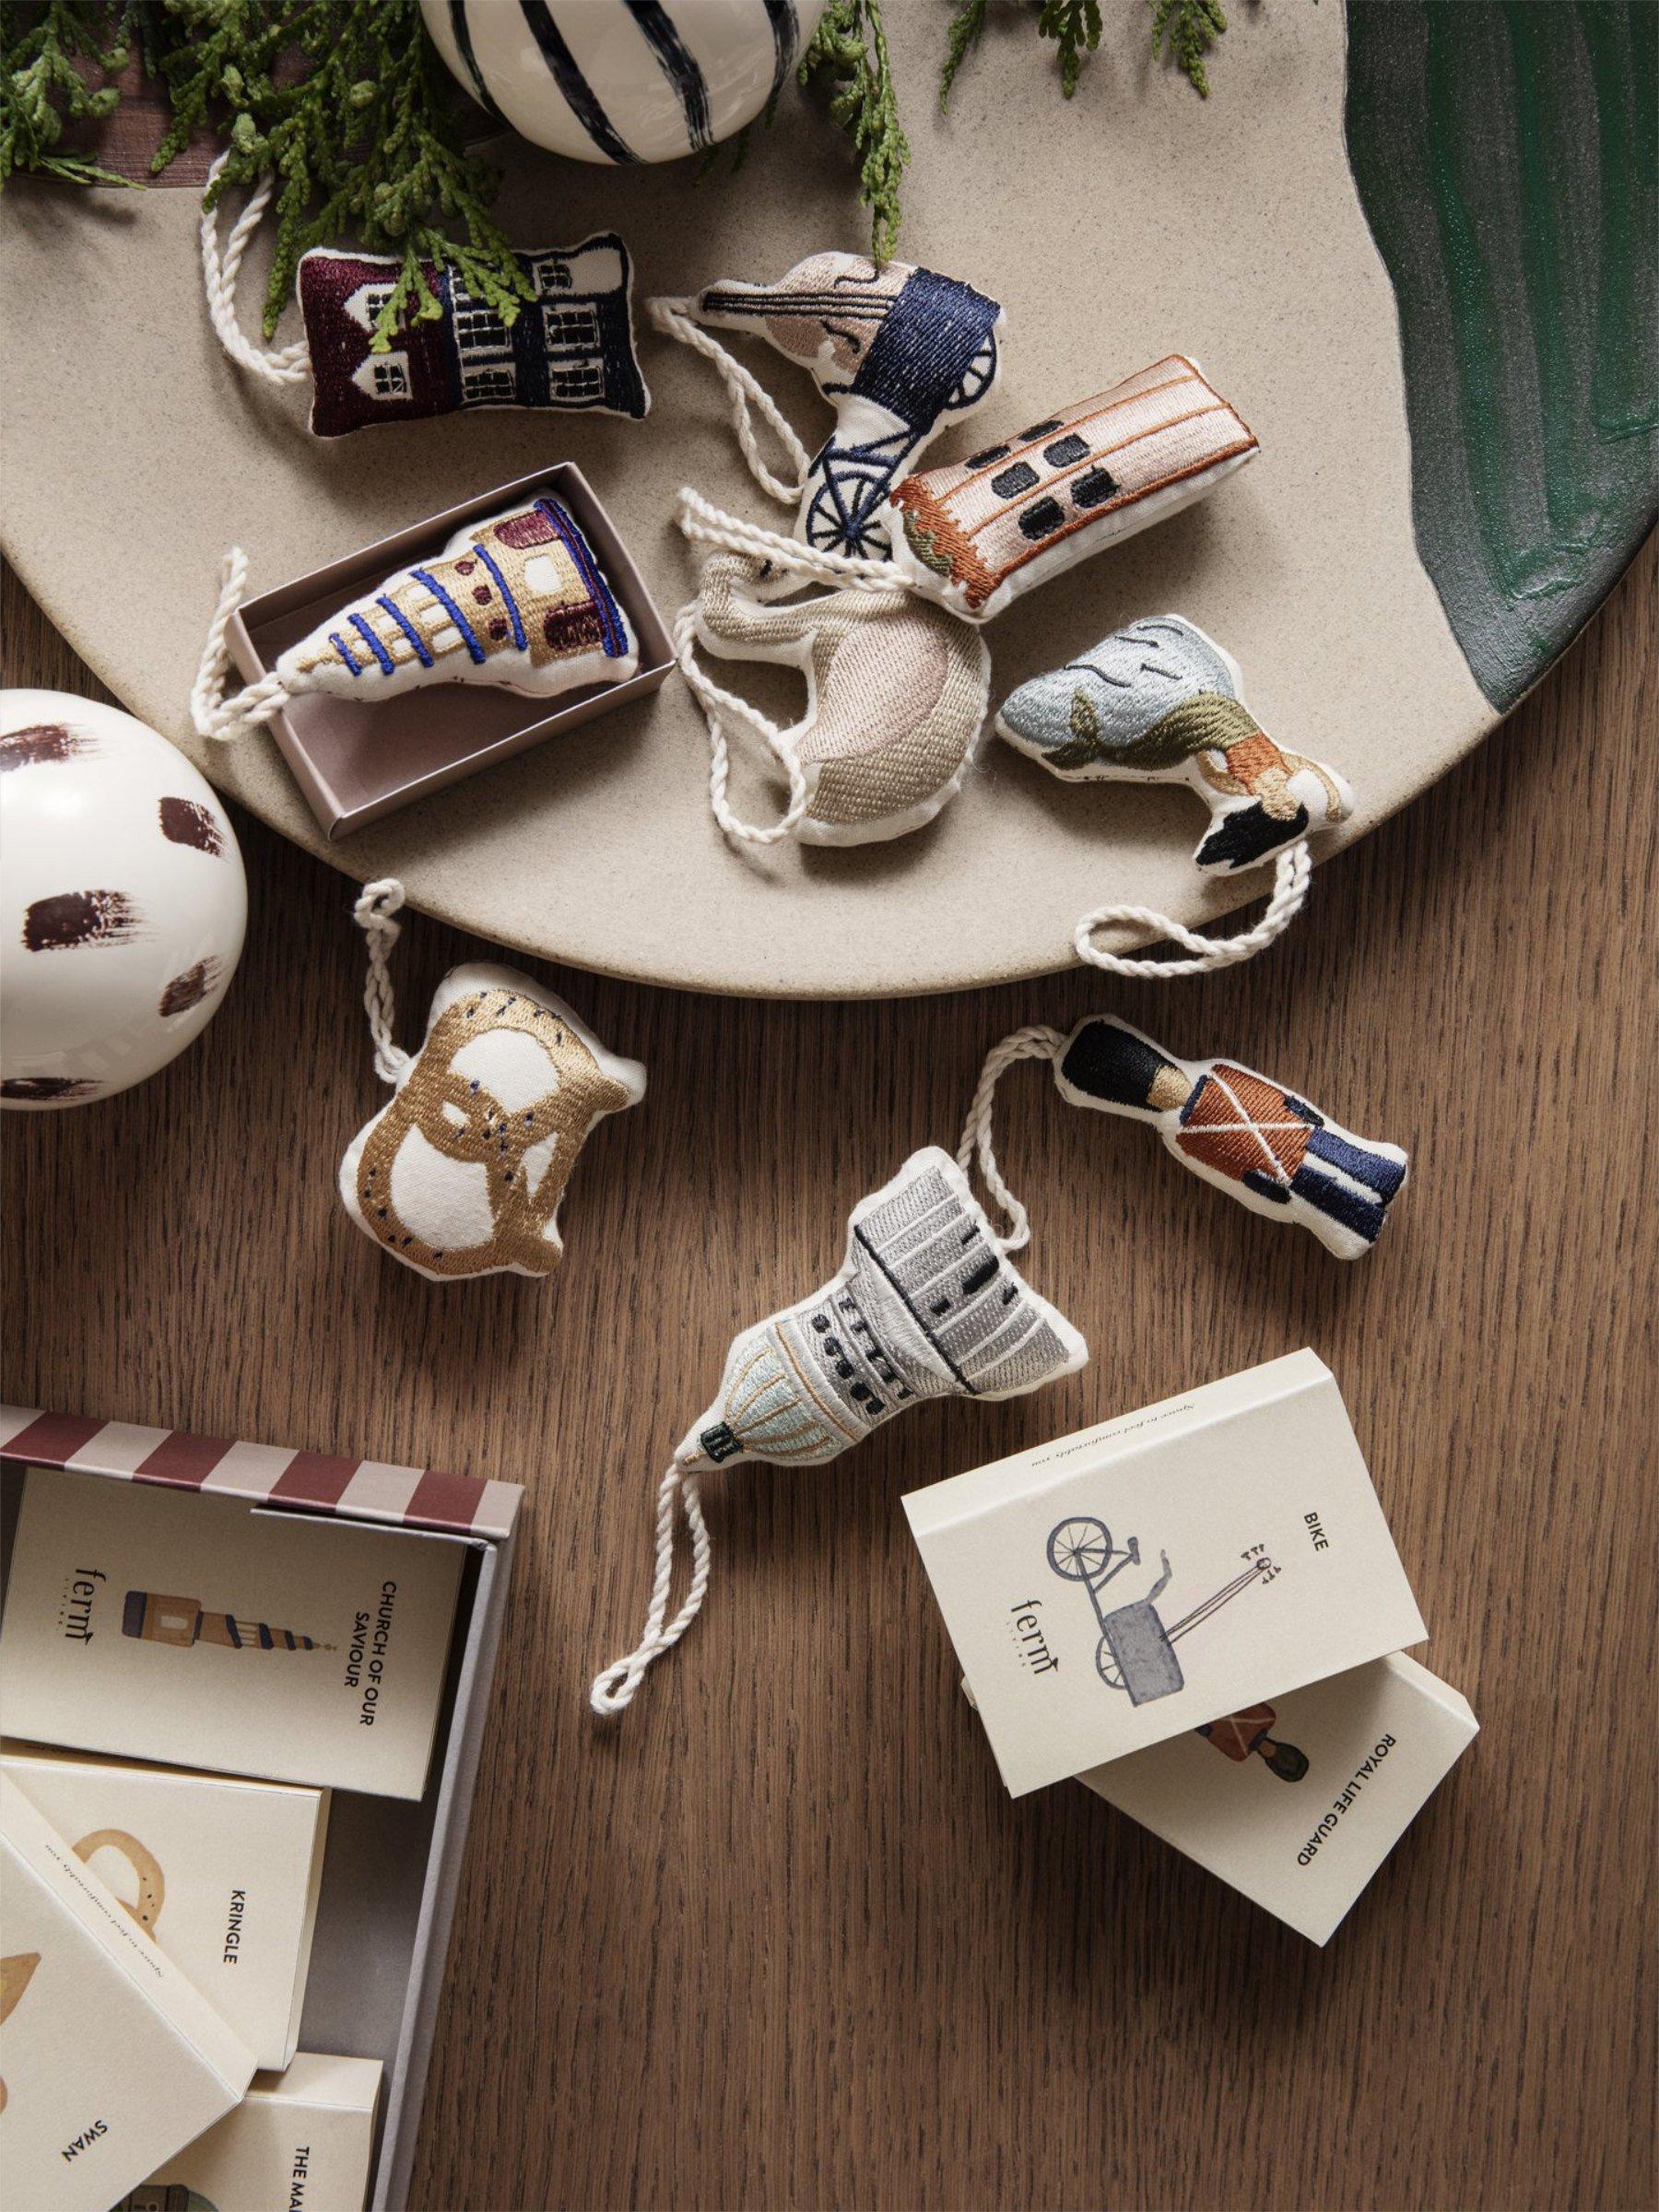 ThatScandinavianFeeling copenhagen ornaments cozy gift guide